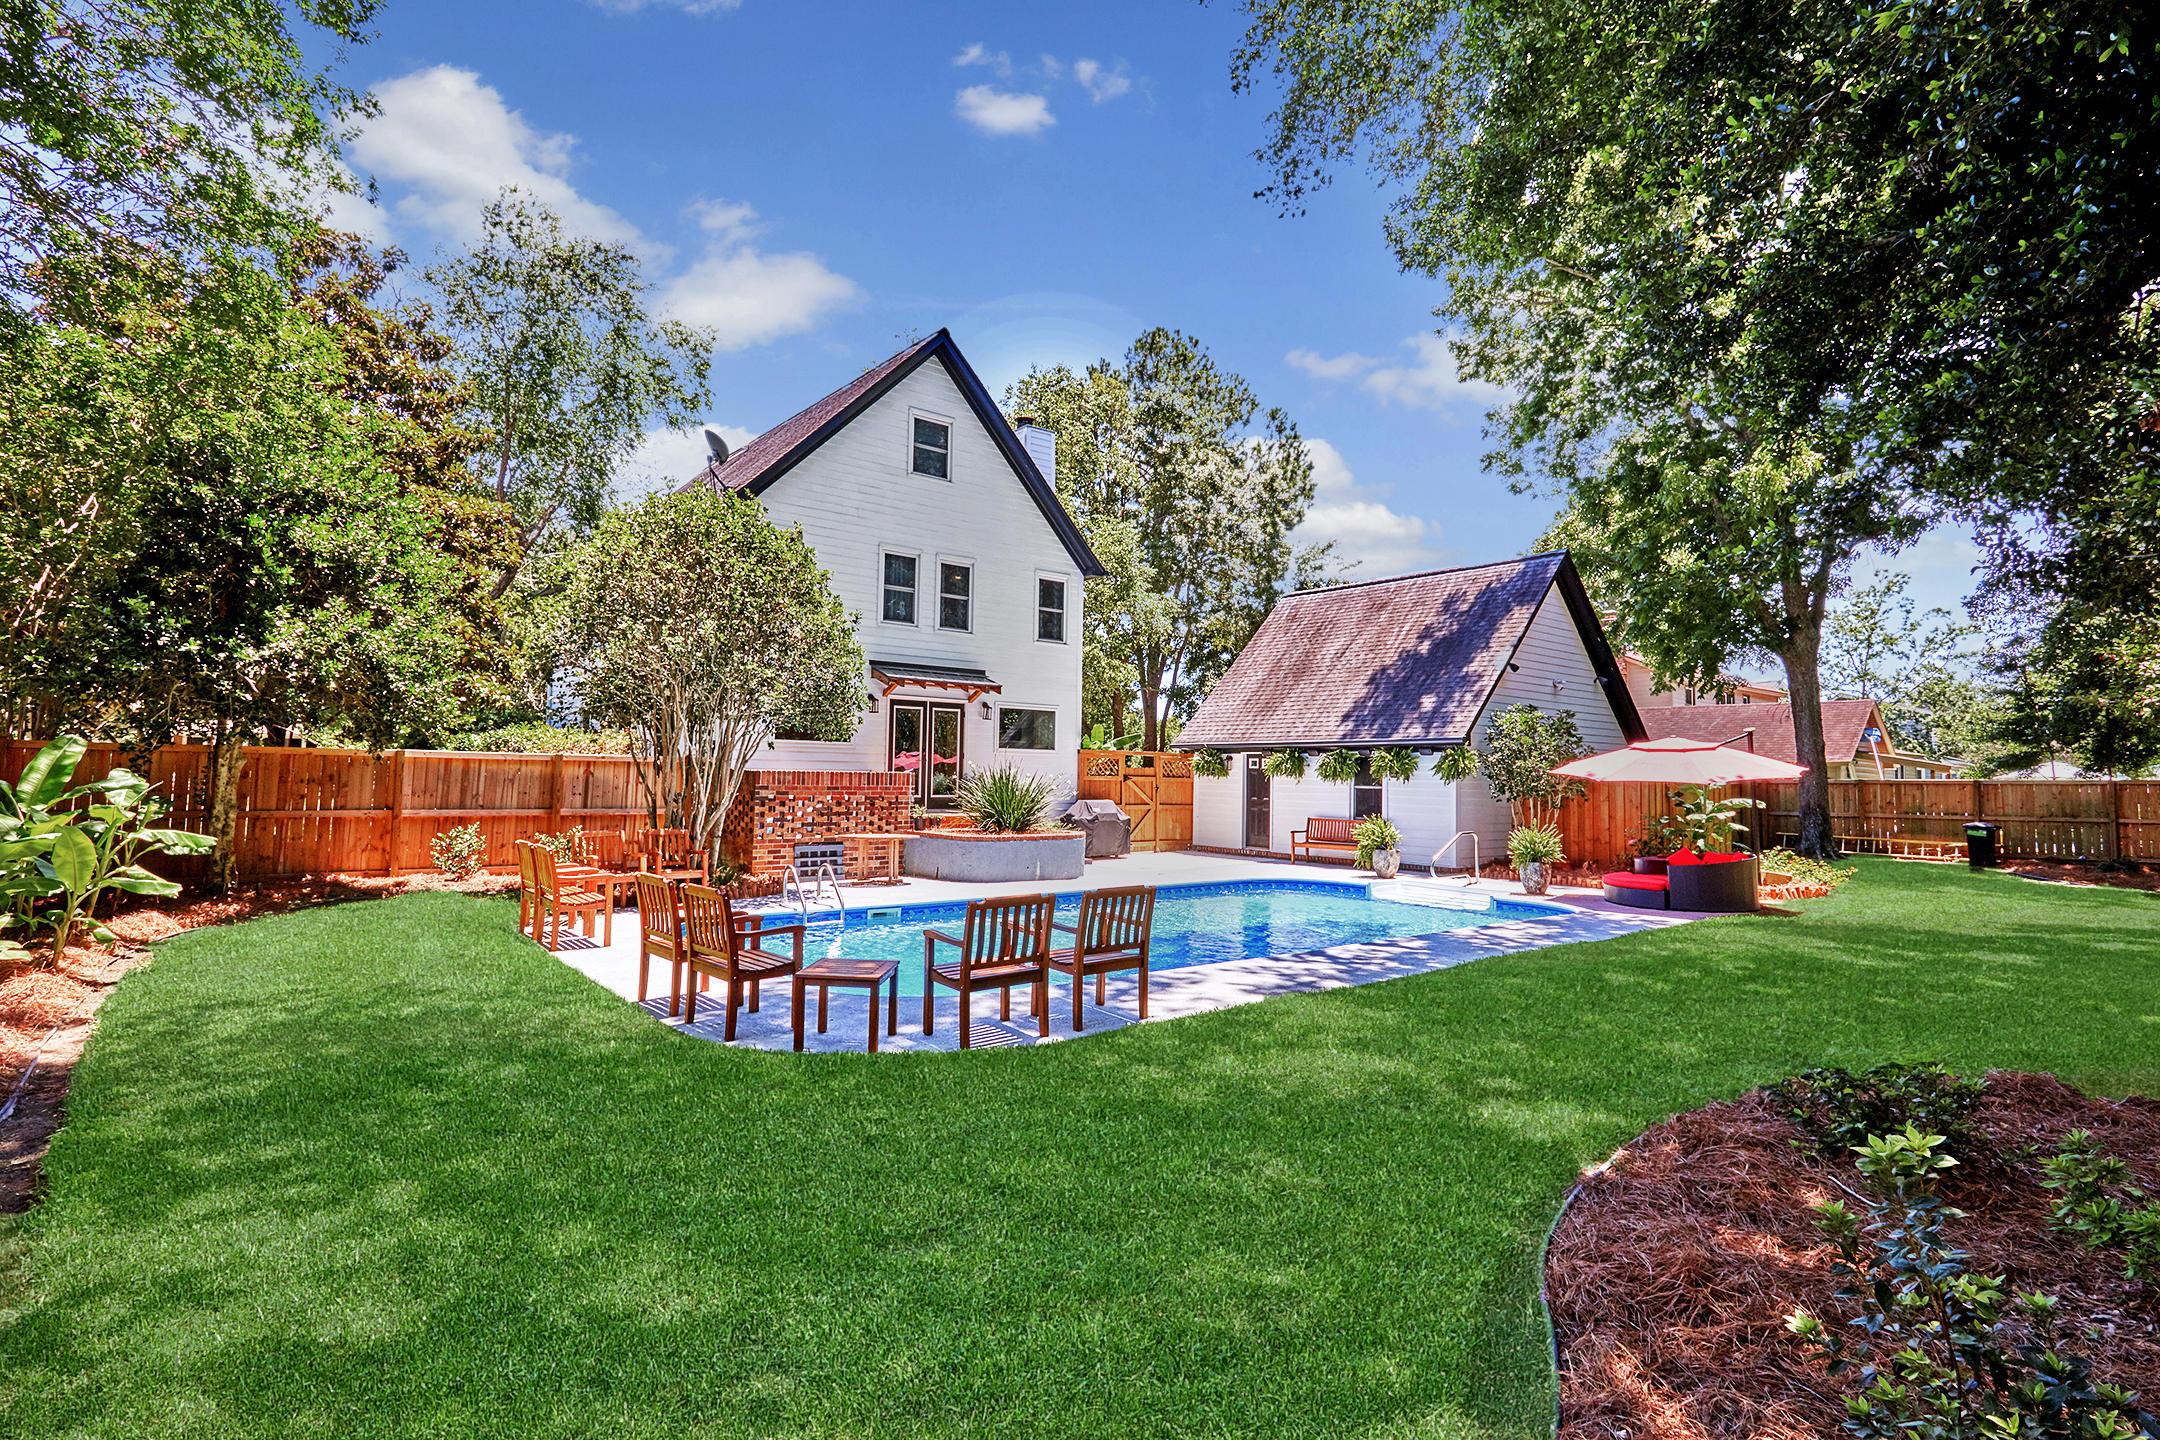 Stiles Point Plantation Homes For Sale - 699 Castle Pinckney, Charleston, SC - 7